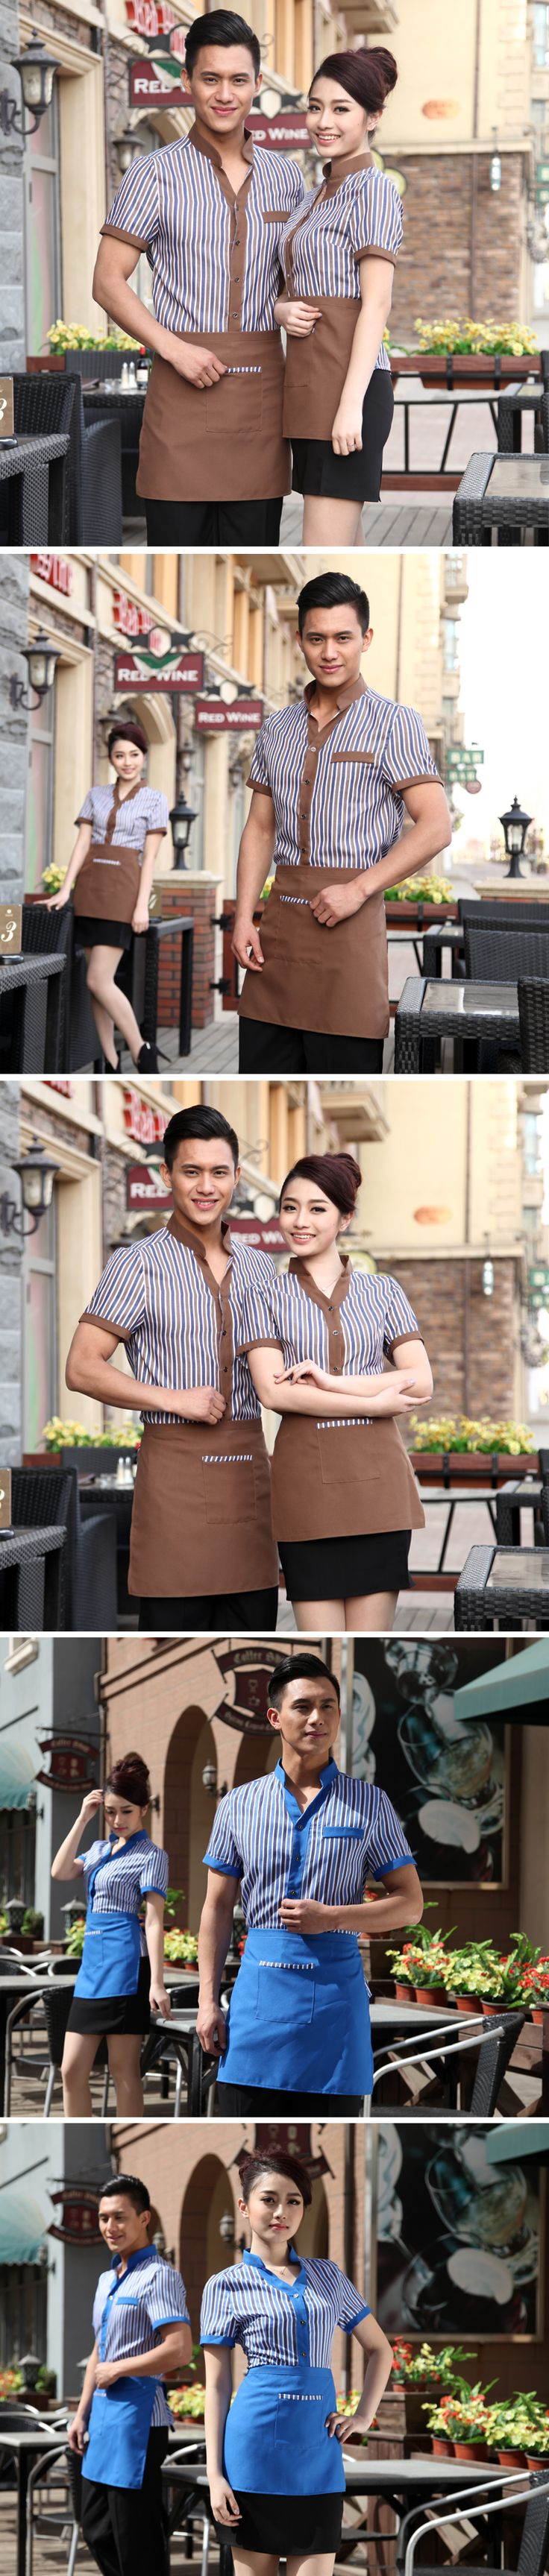 Cafe Uniforms Summer Hotel Restaurant Catering Short Sleeved Overalls Restaurant Waitress Uniforms Hotel Reception Uniform V101 on Aliexpress.com | Alibaba Group